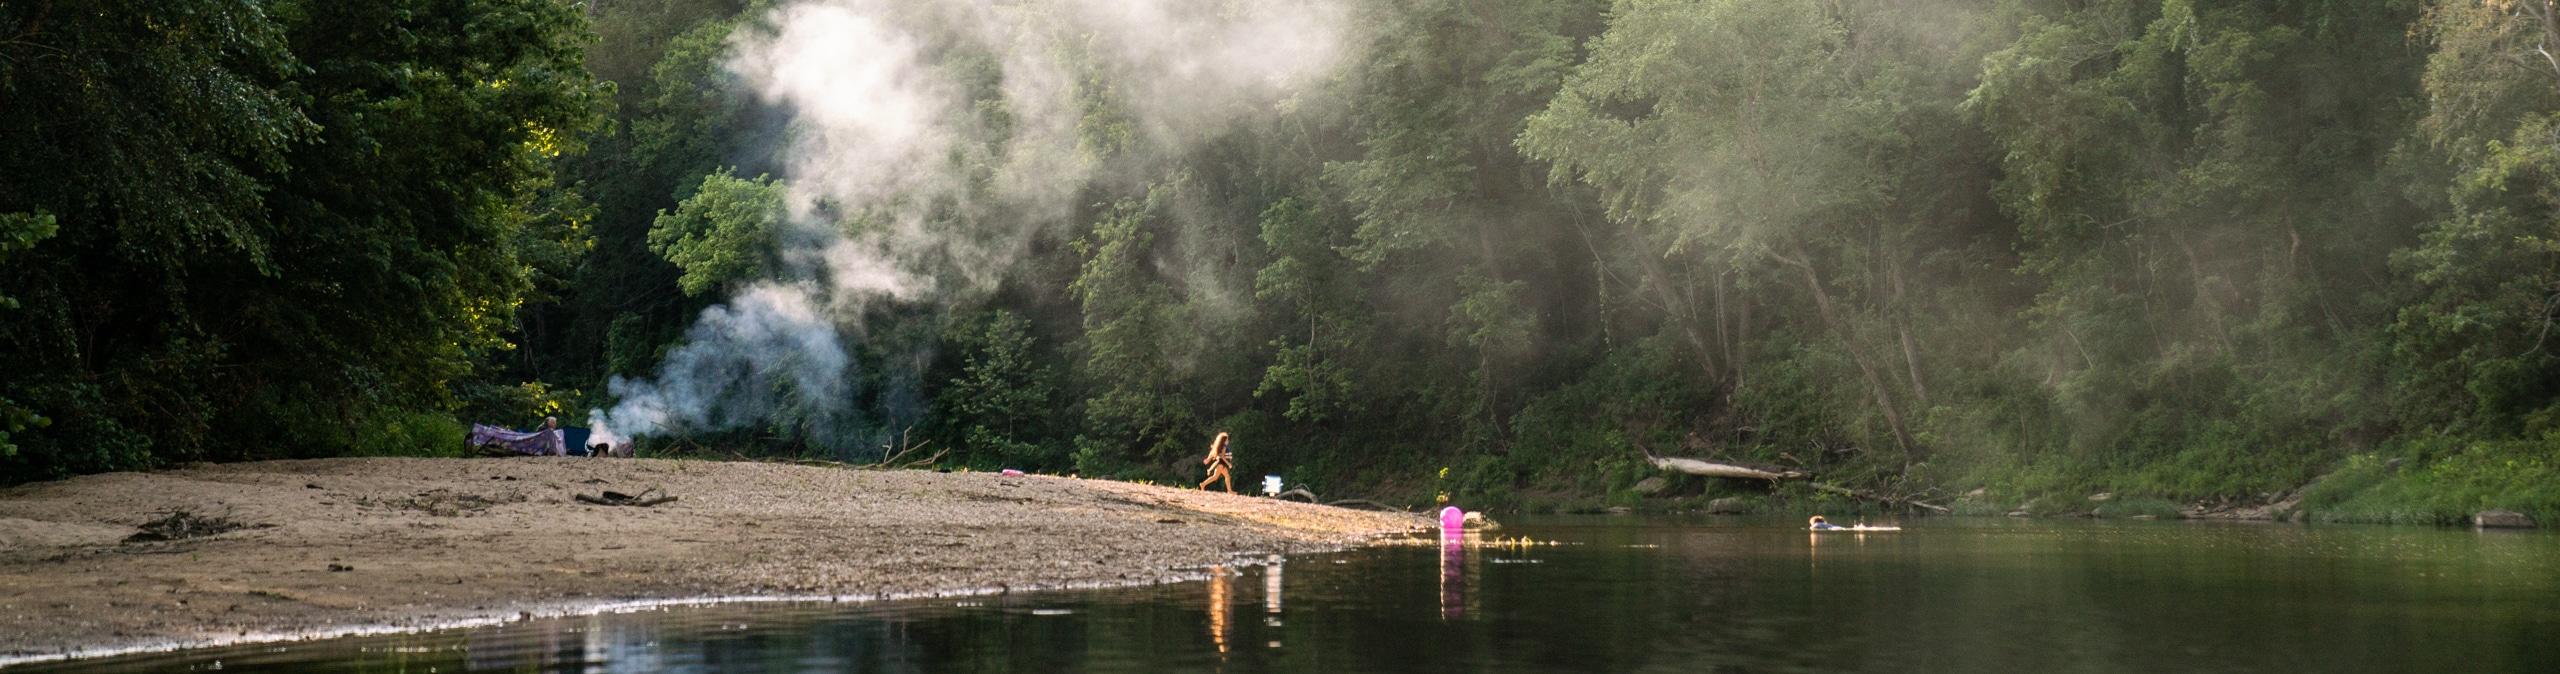 Family camping along rock bar on the Buffalo National River